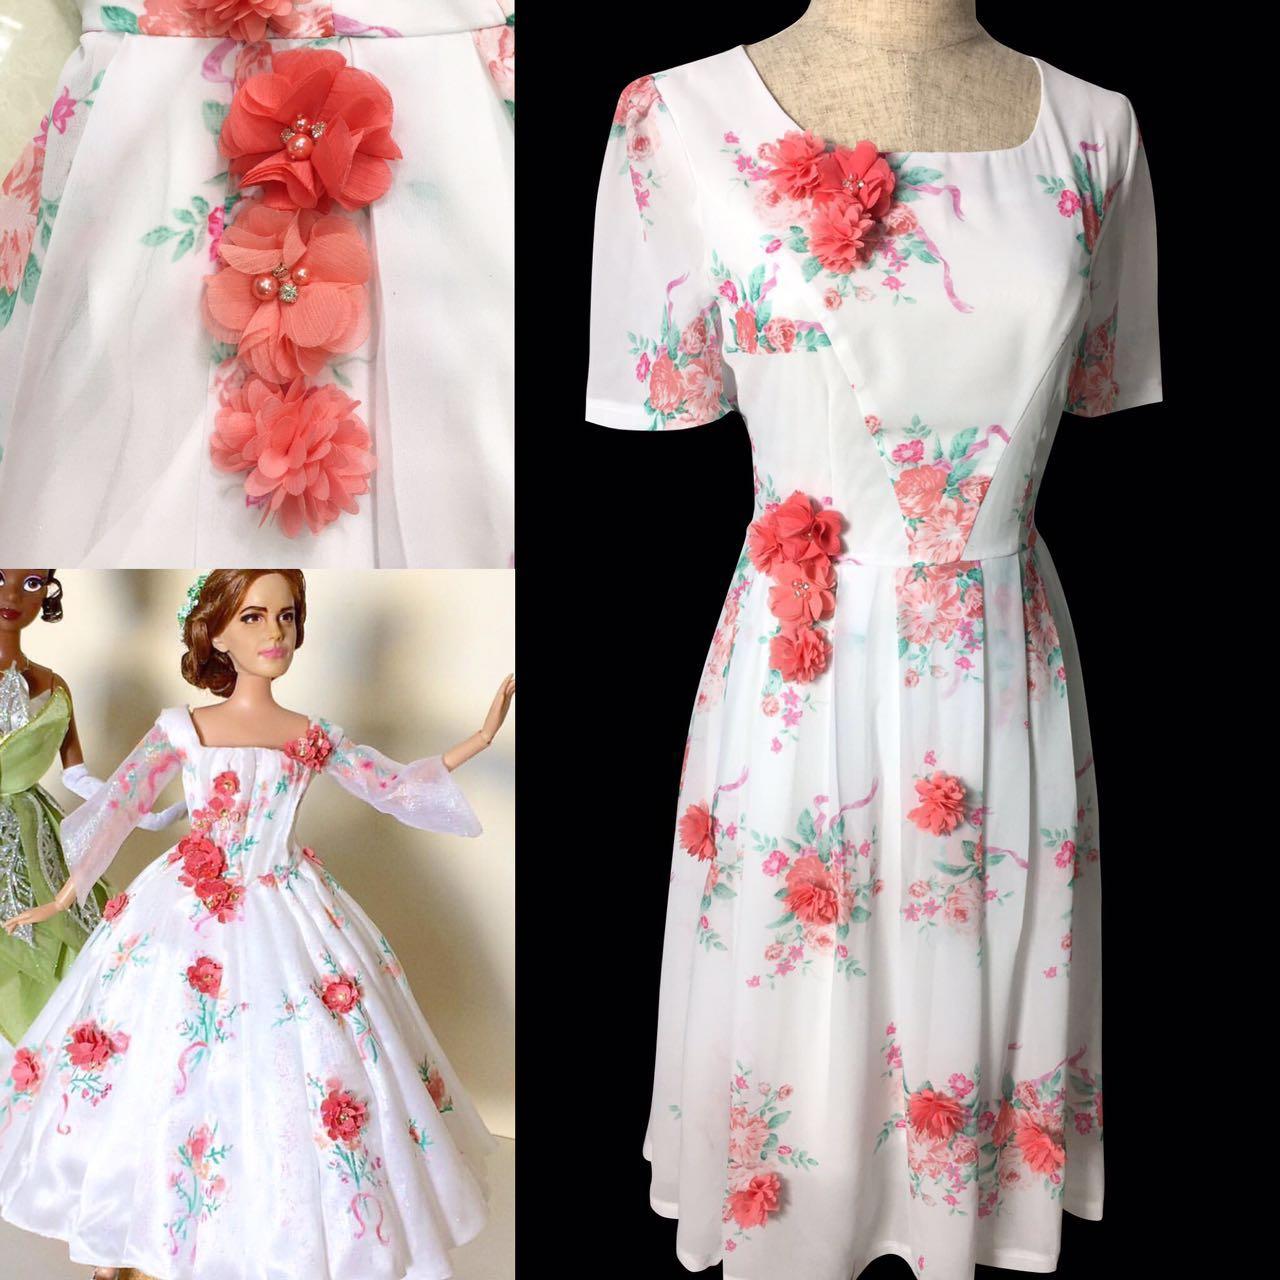 Bm31 belle 2017 white dress celebration dress disneybound chiffon bm31 belle 2017 white dress celebration dress disneybound chiffon dress with flower thumbnail 2 mightylinksfo